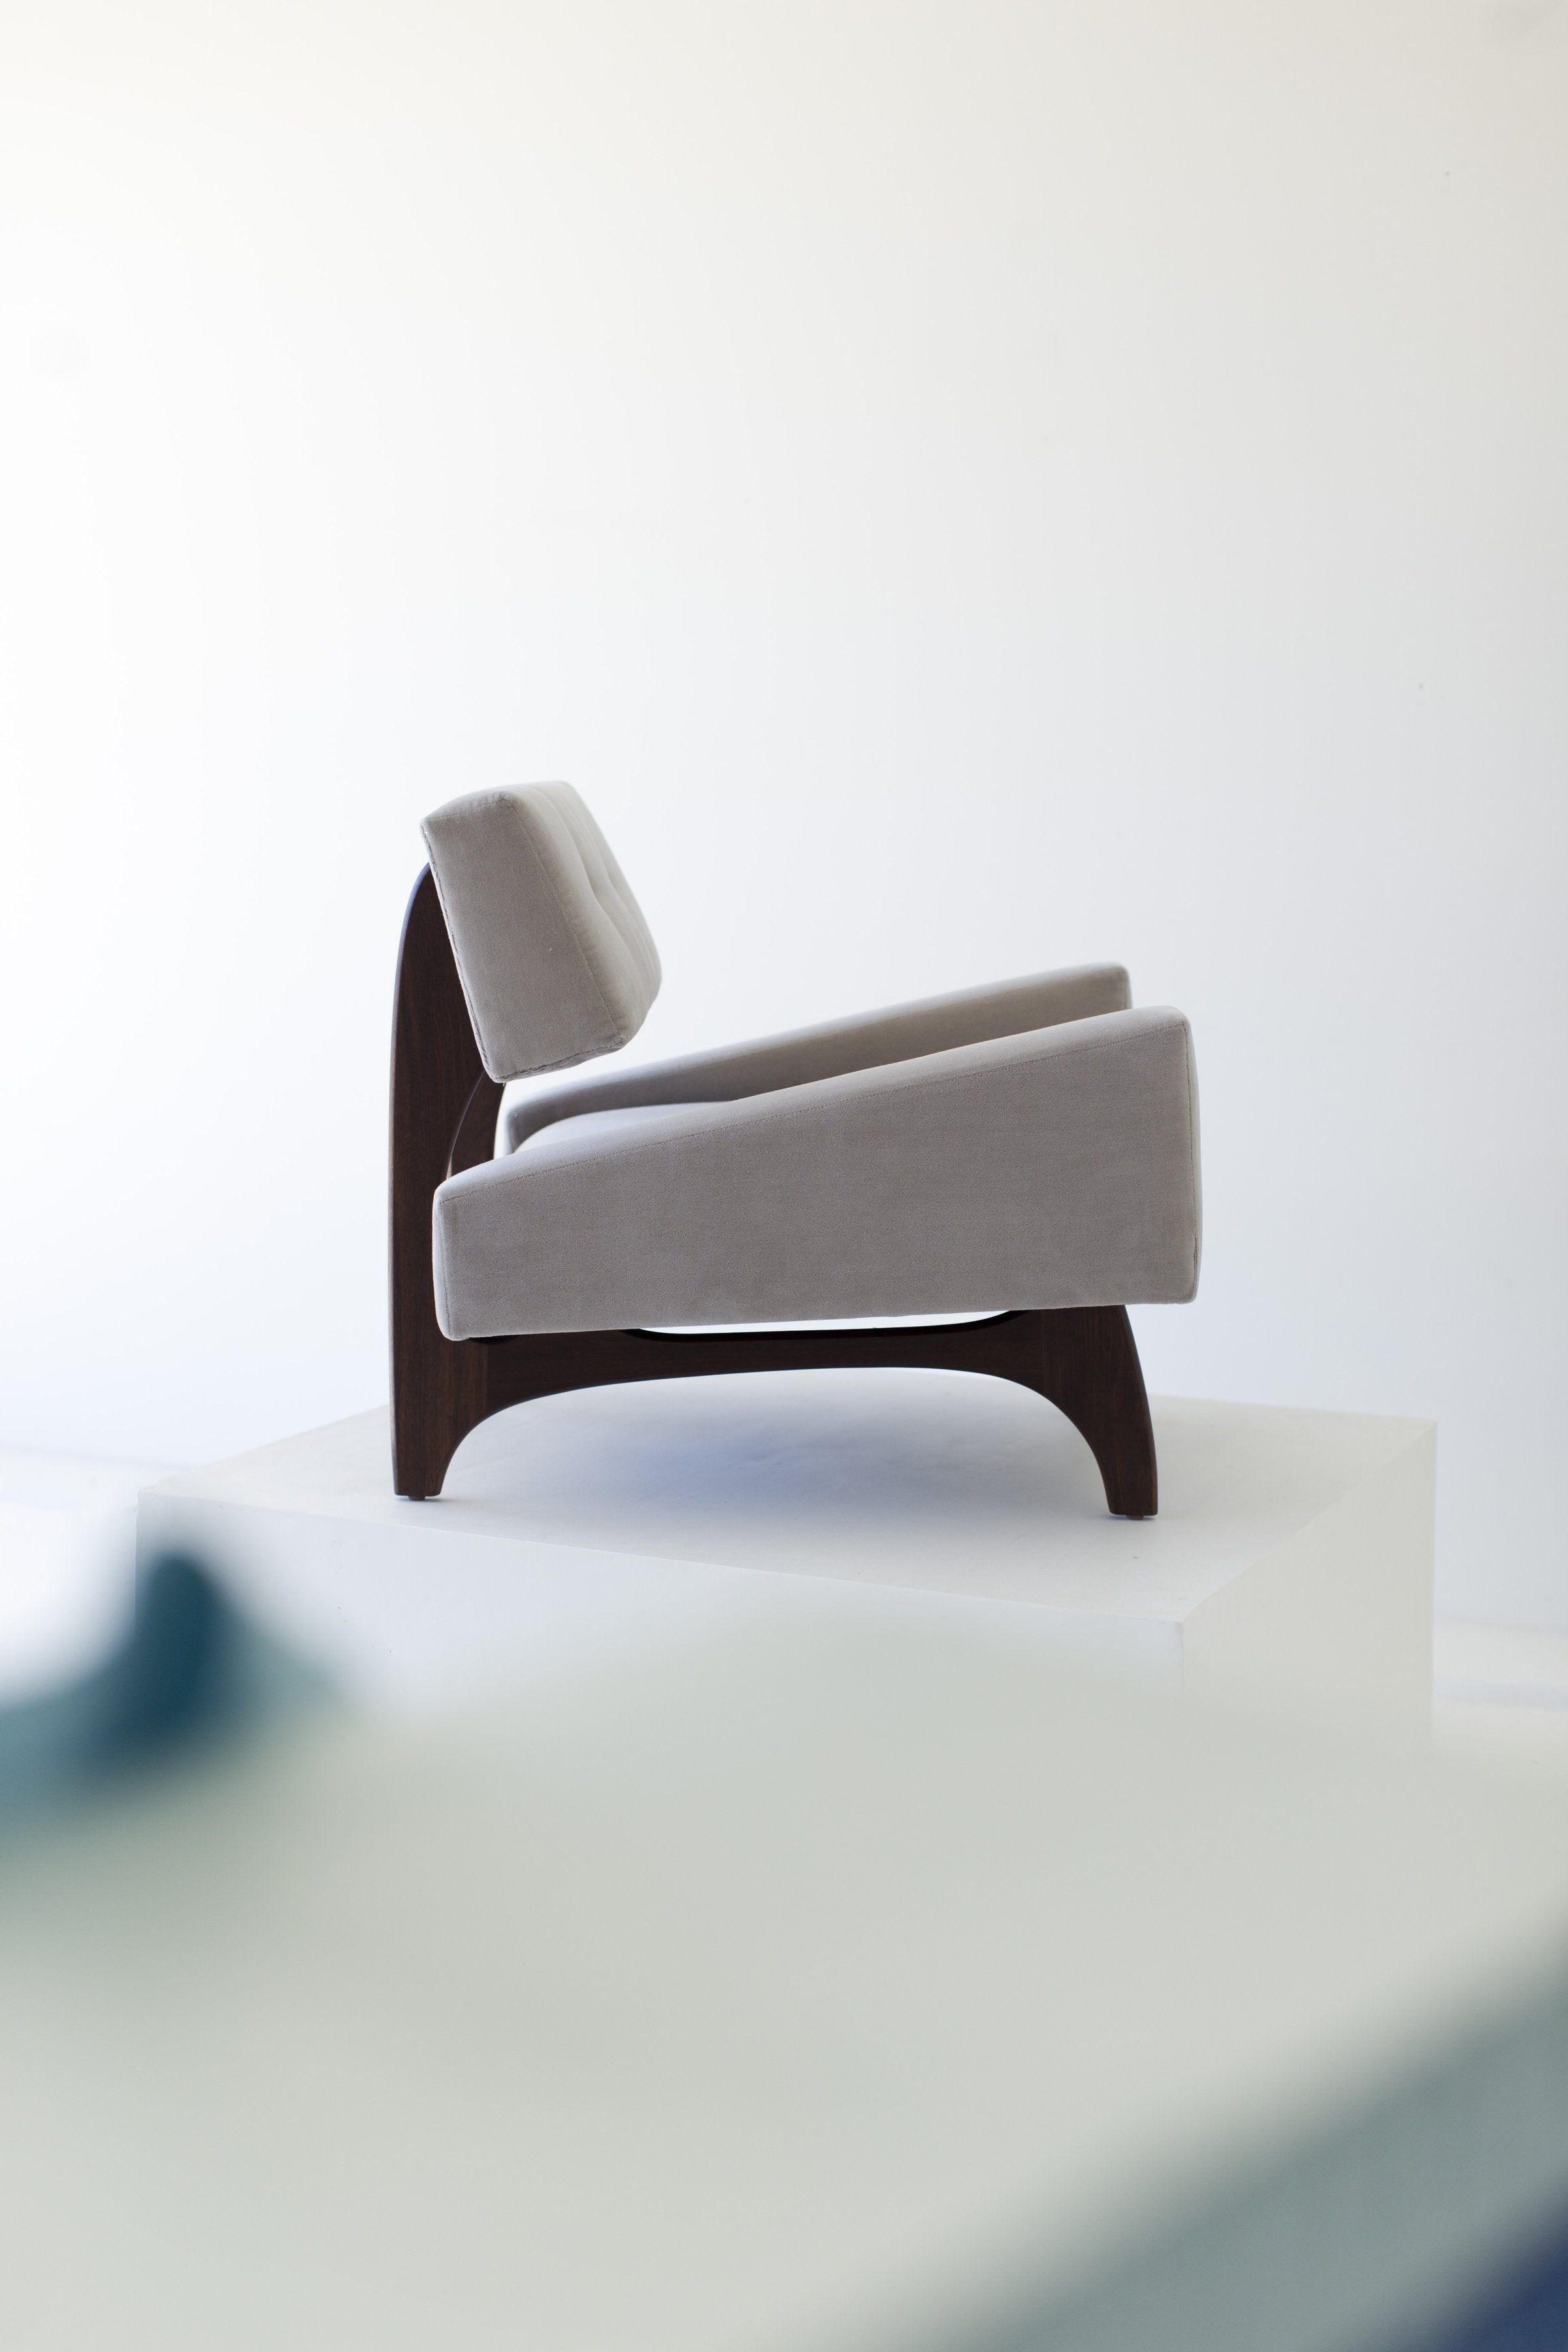 Modern Lounge Chair 01 Armchair Furniture Modern Lounge Chairs Armchair Design